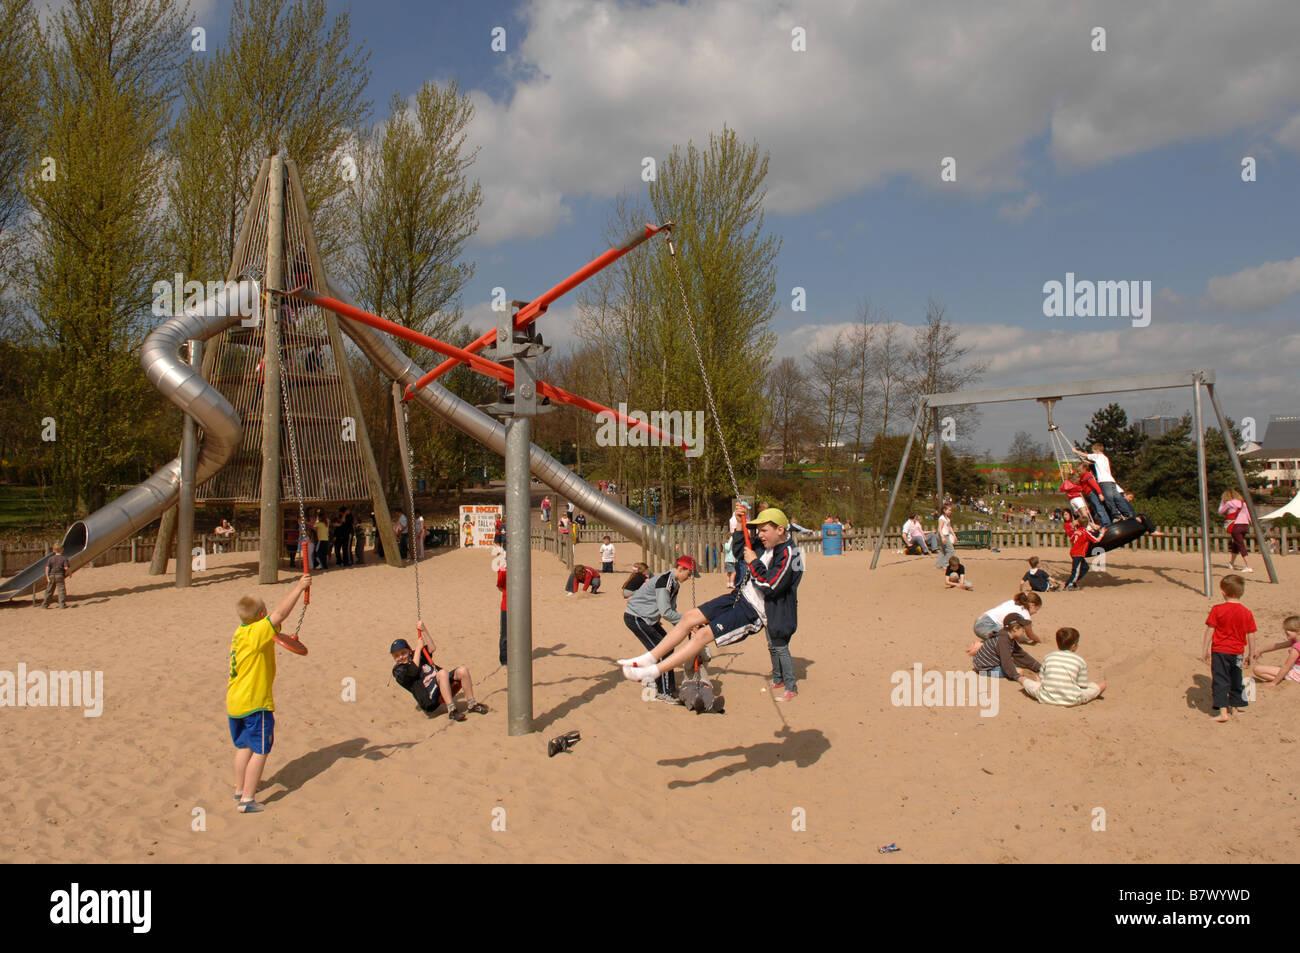 Telford town park shropshire uk england stock photo for Park towne